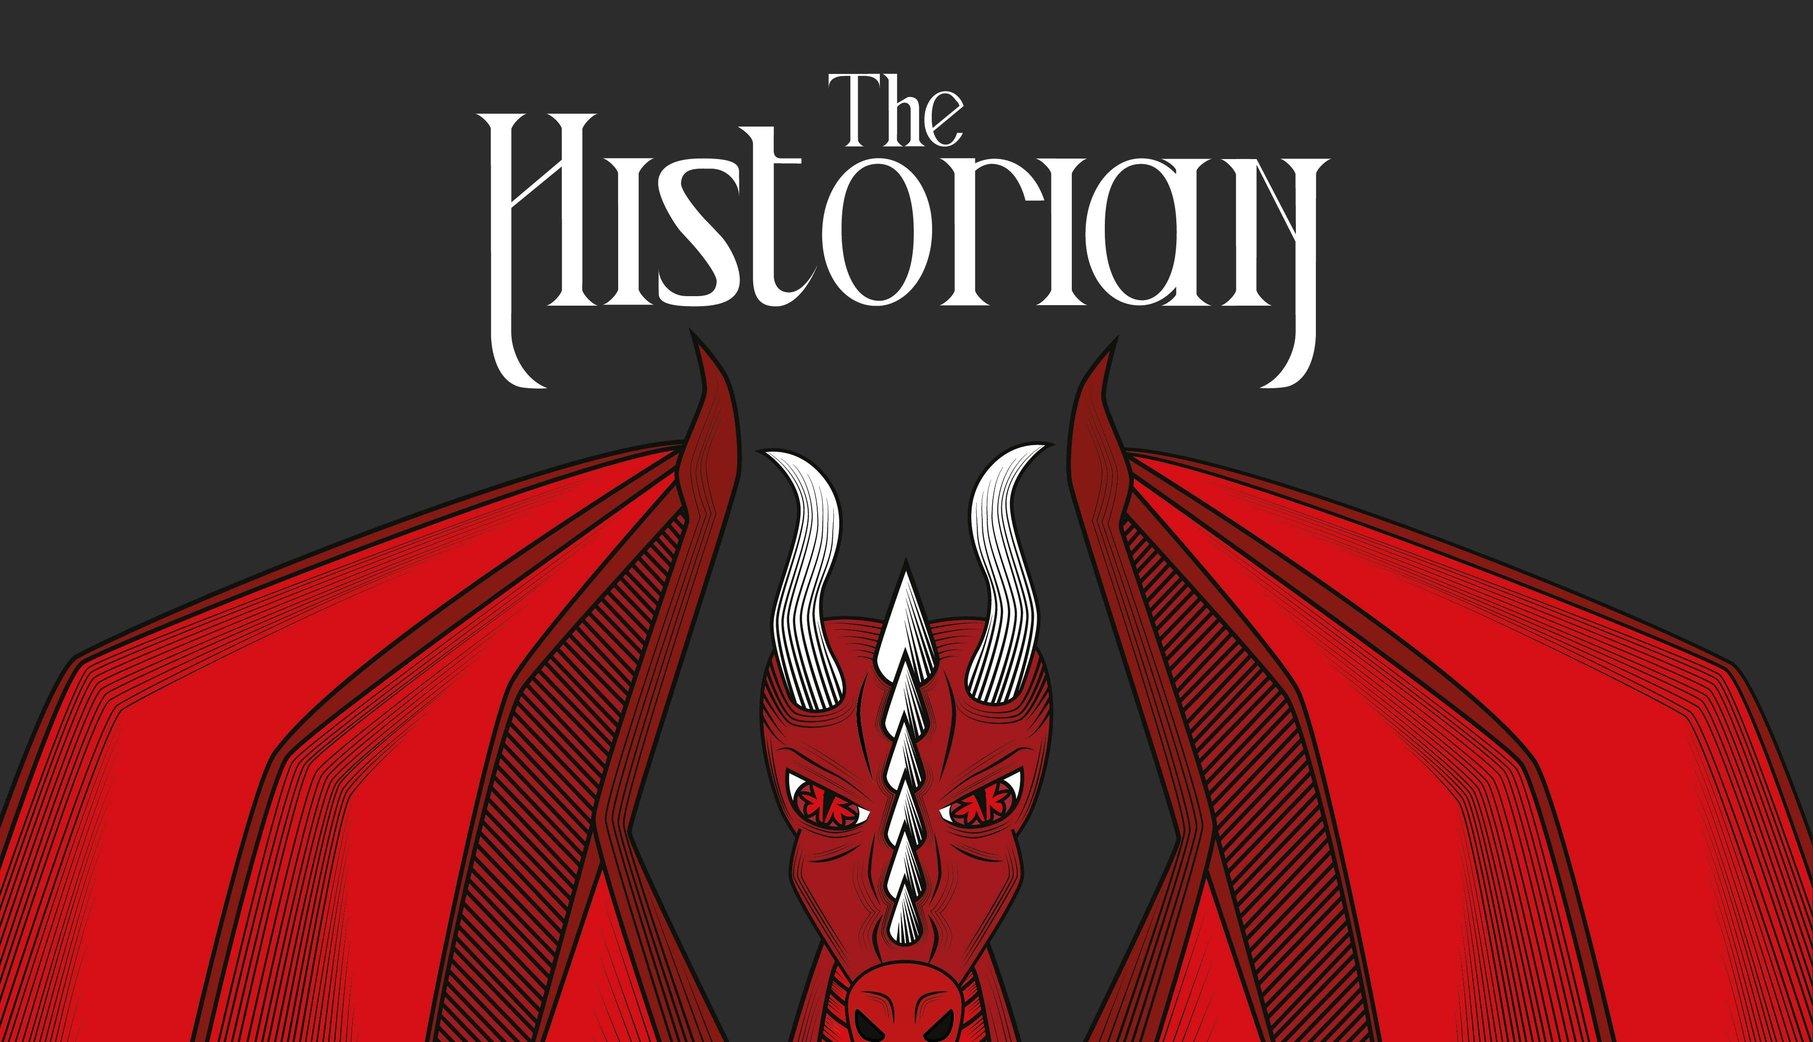 This Historian